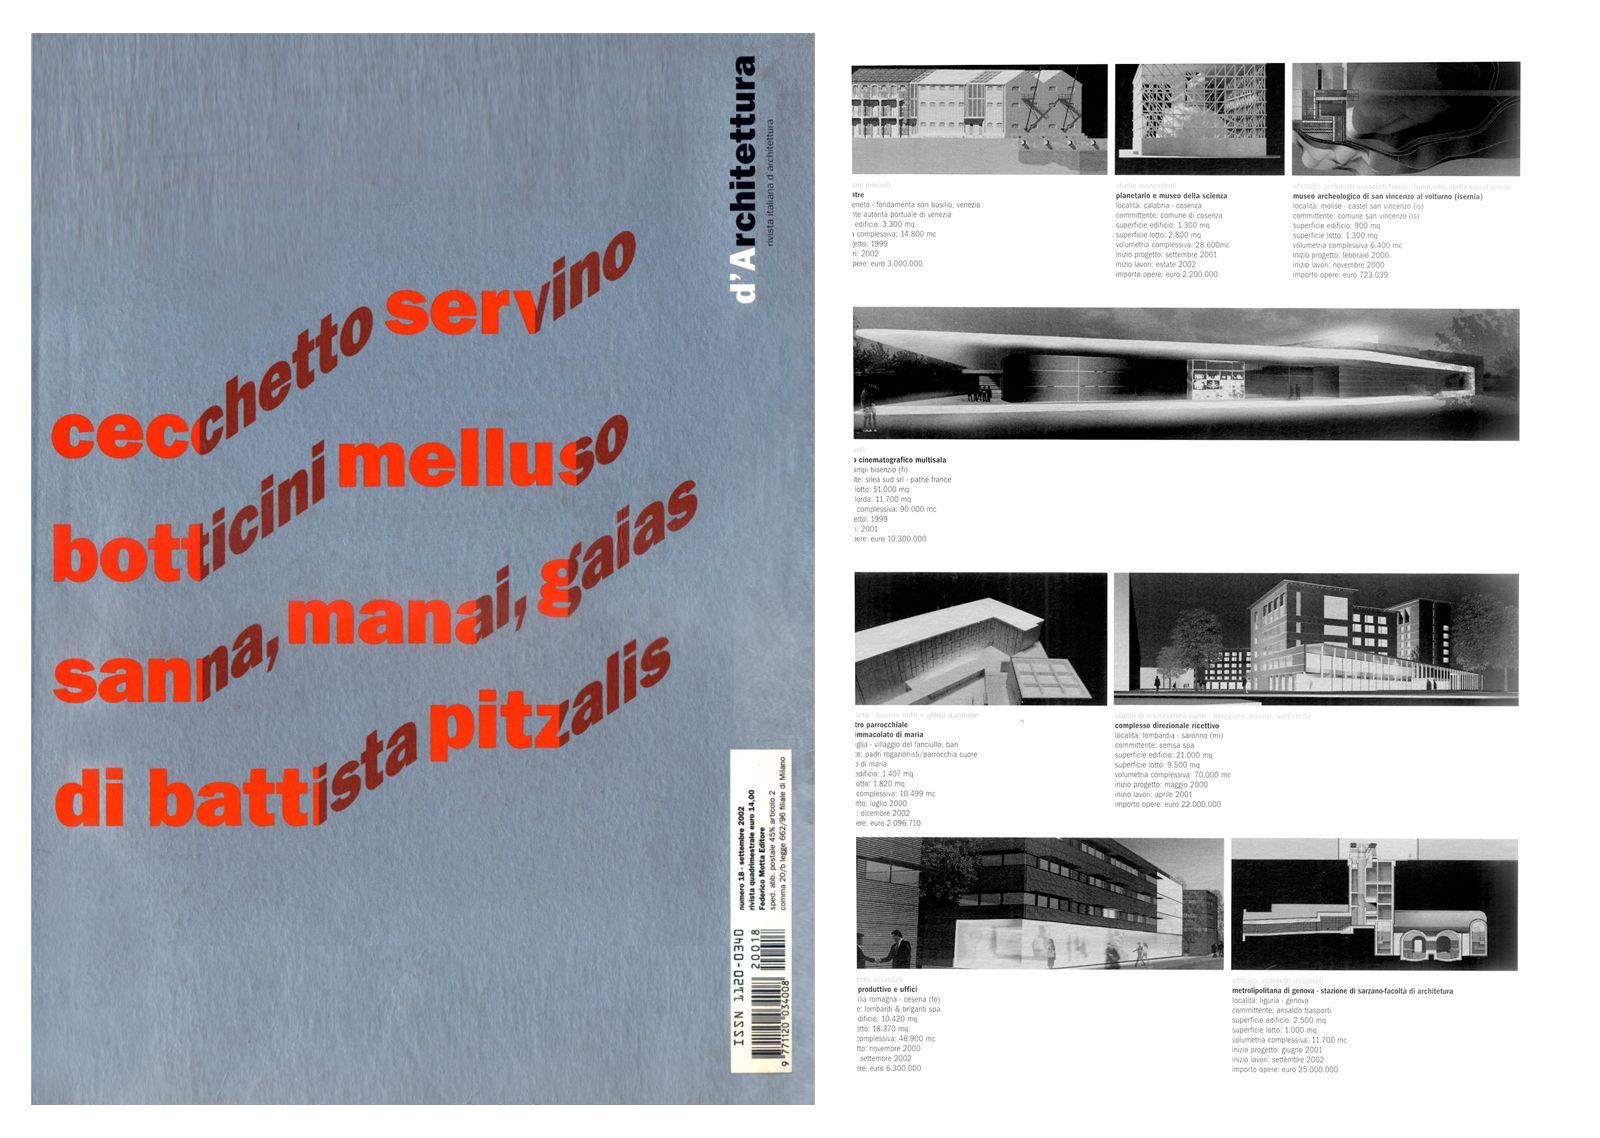 D'Architettura N°18 - Settembre 2002, pag. 61